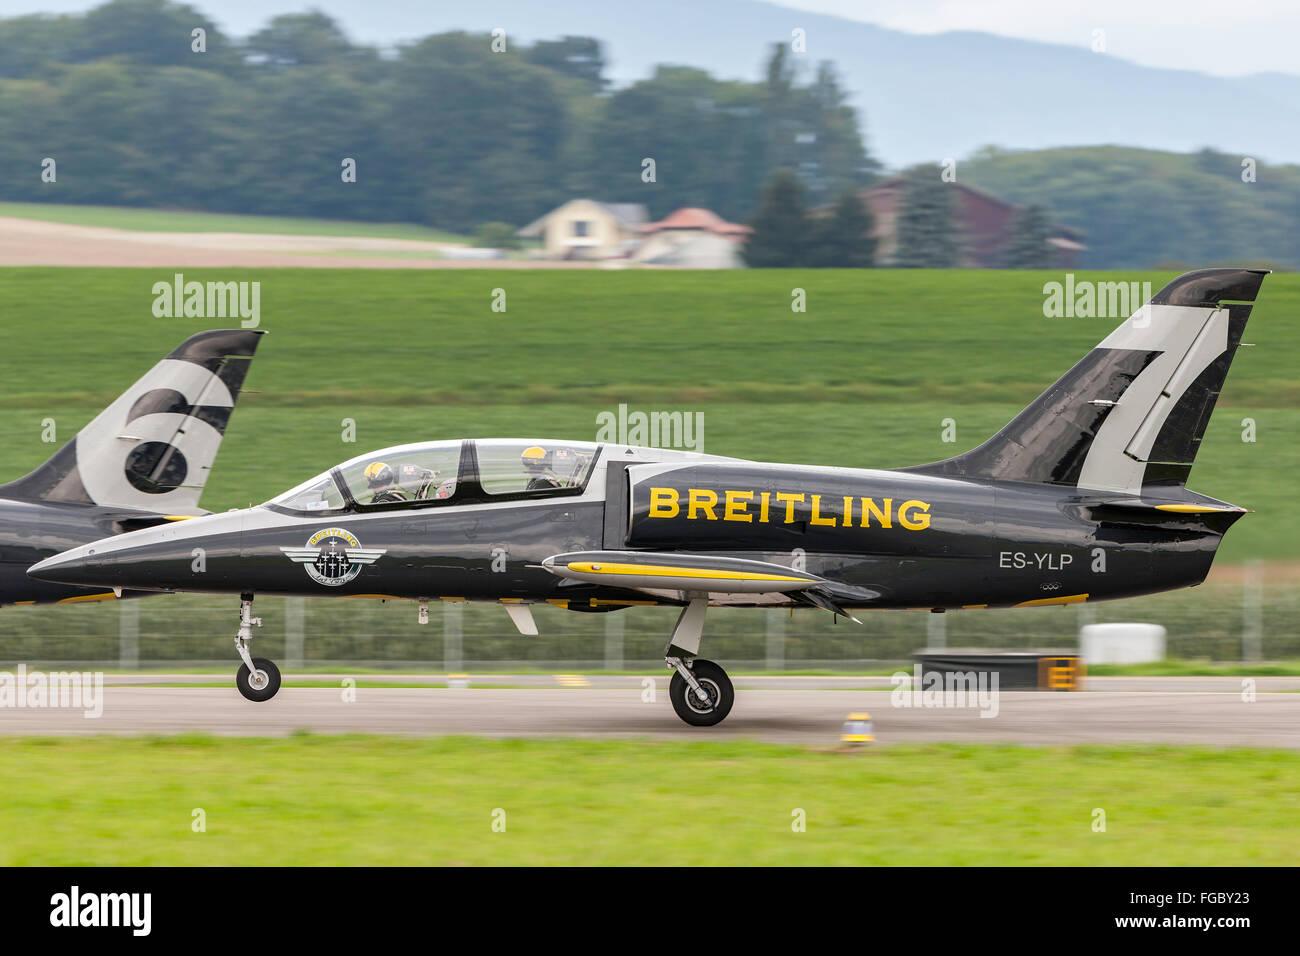 Aero L-39 Albatross trainer aircraft of the Breitling Jet Team - Stock Image